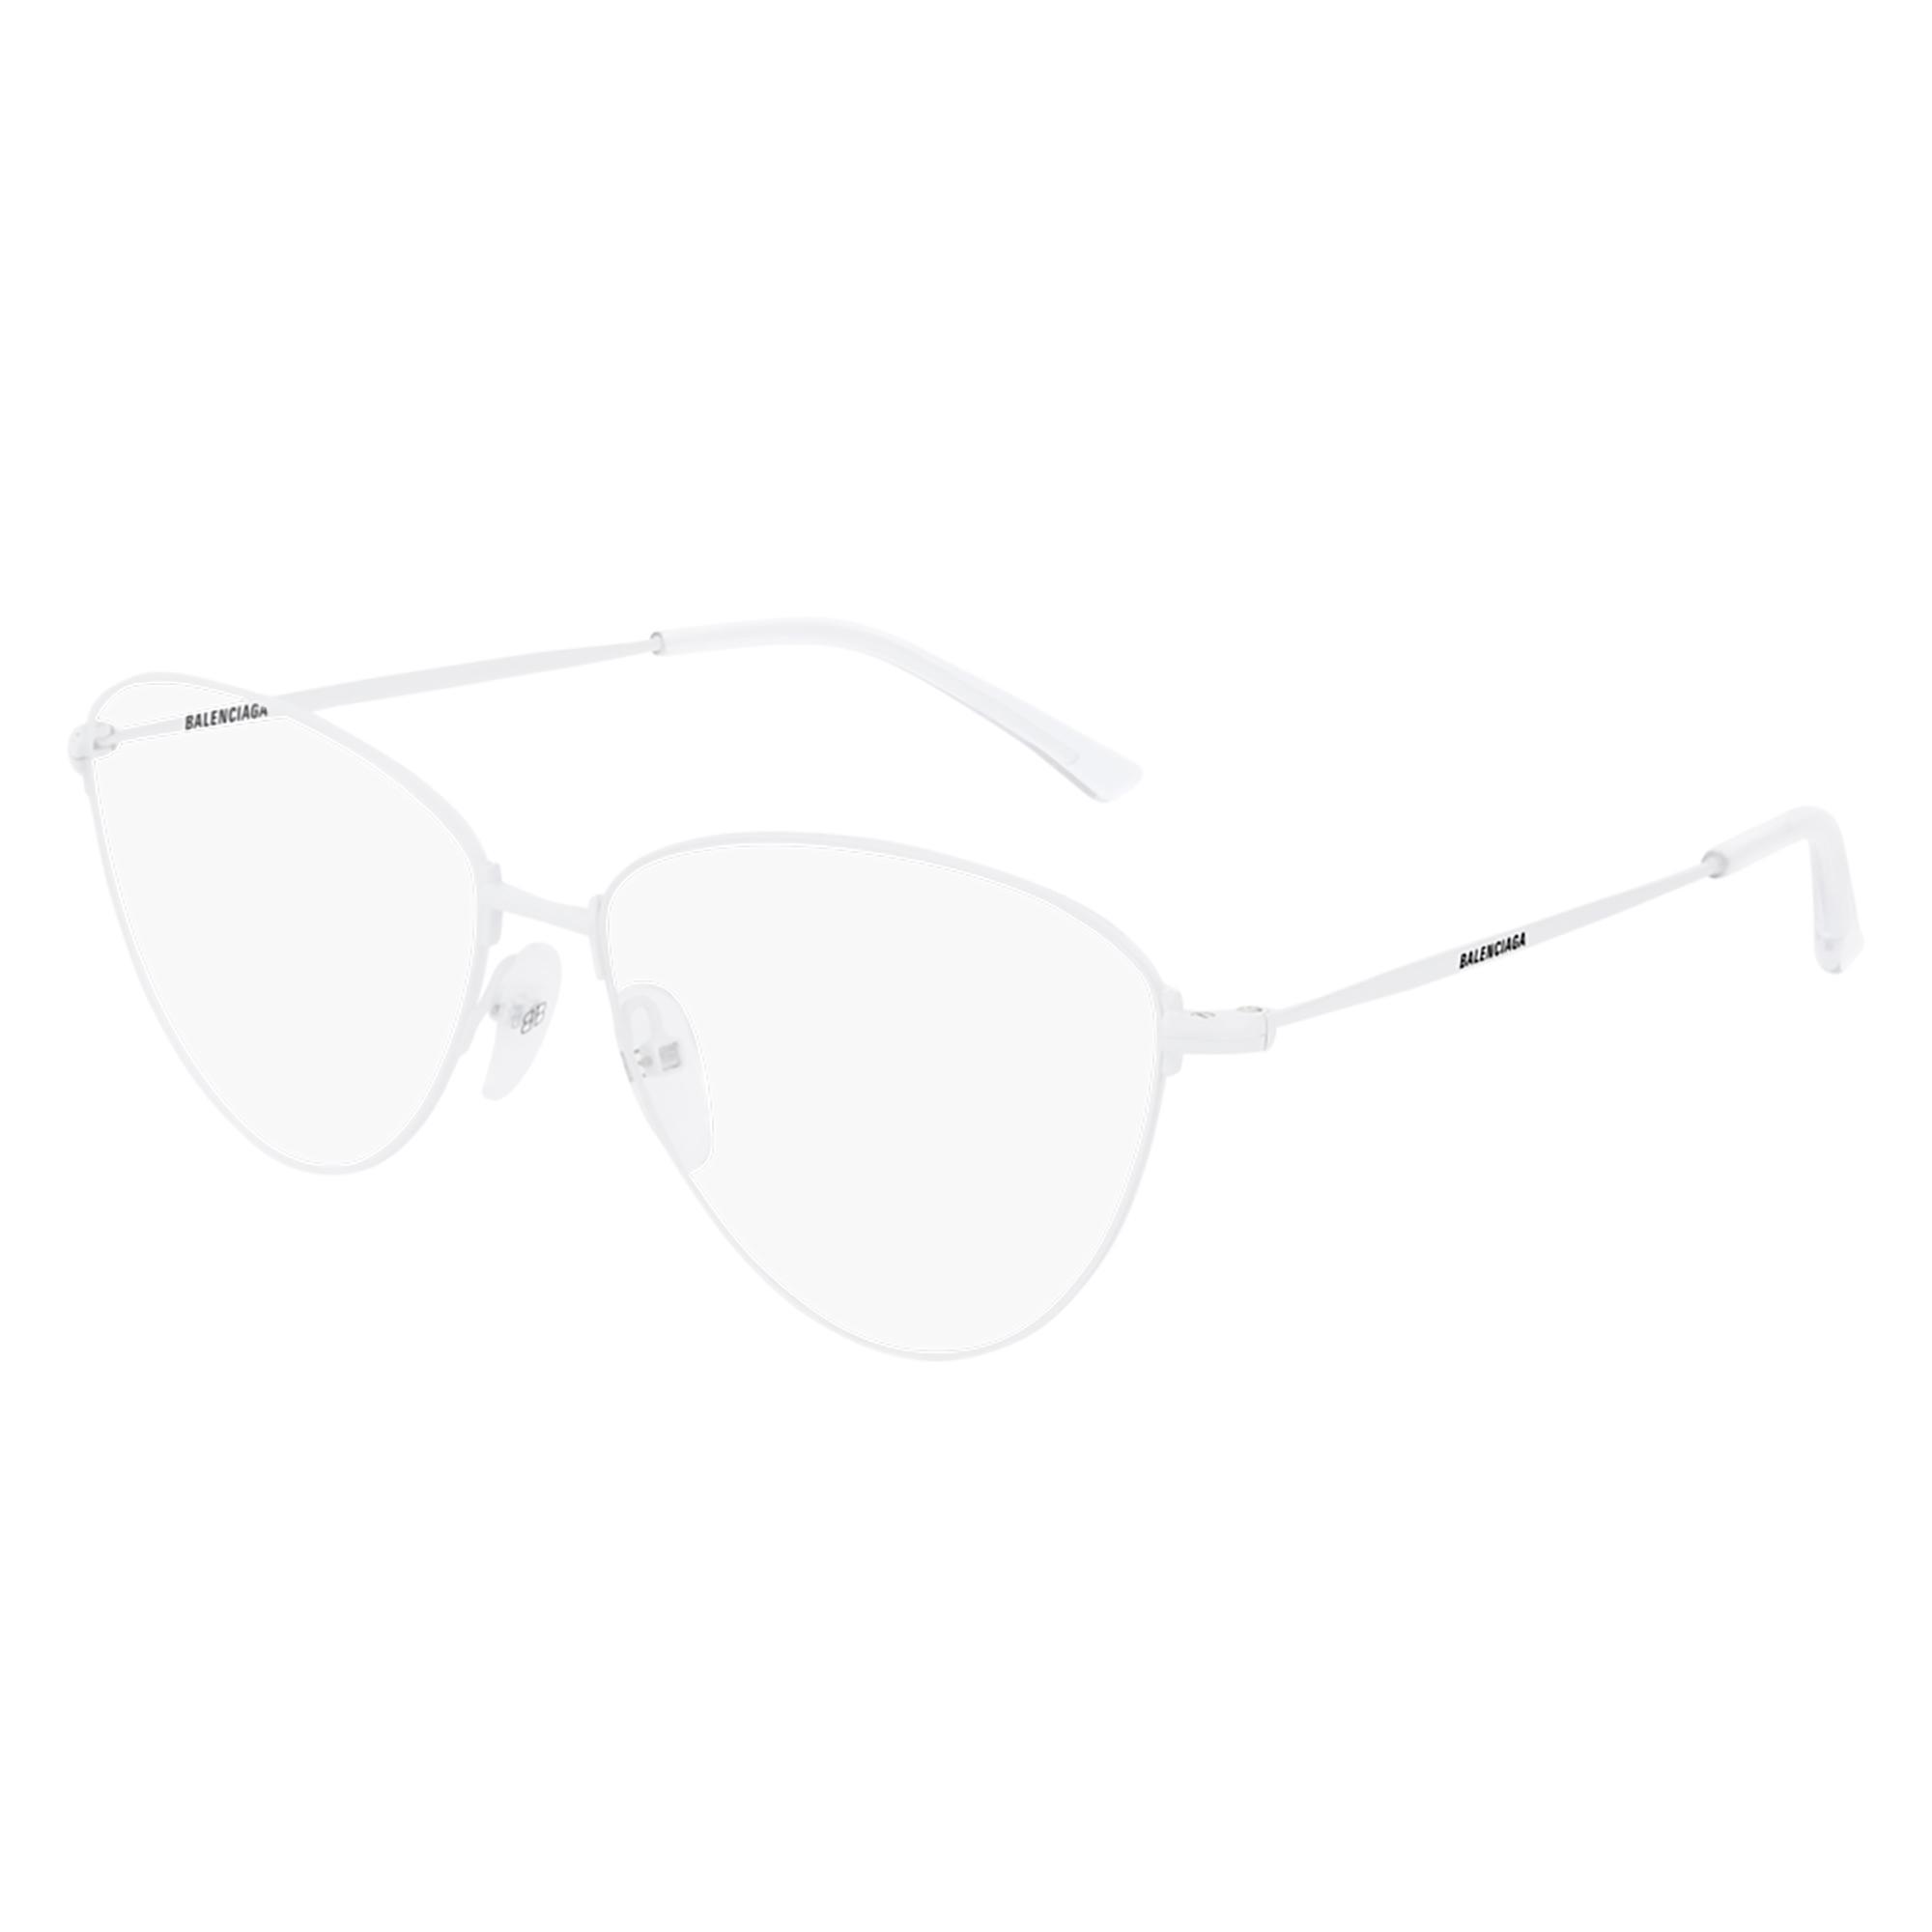 004 white white transpare